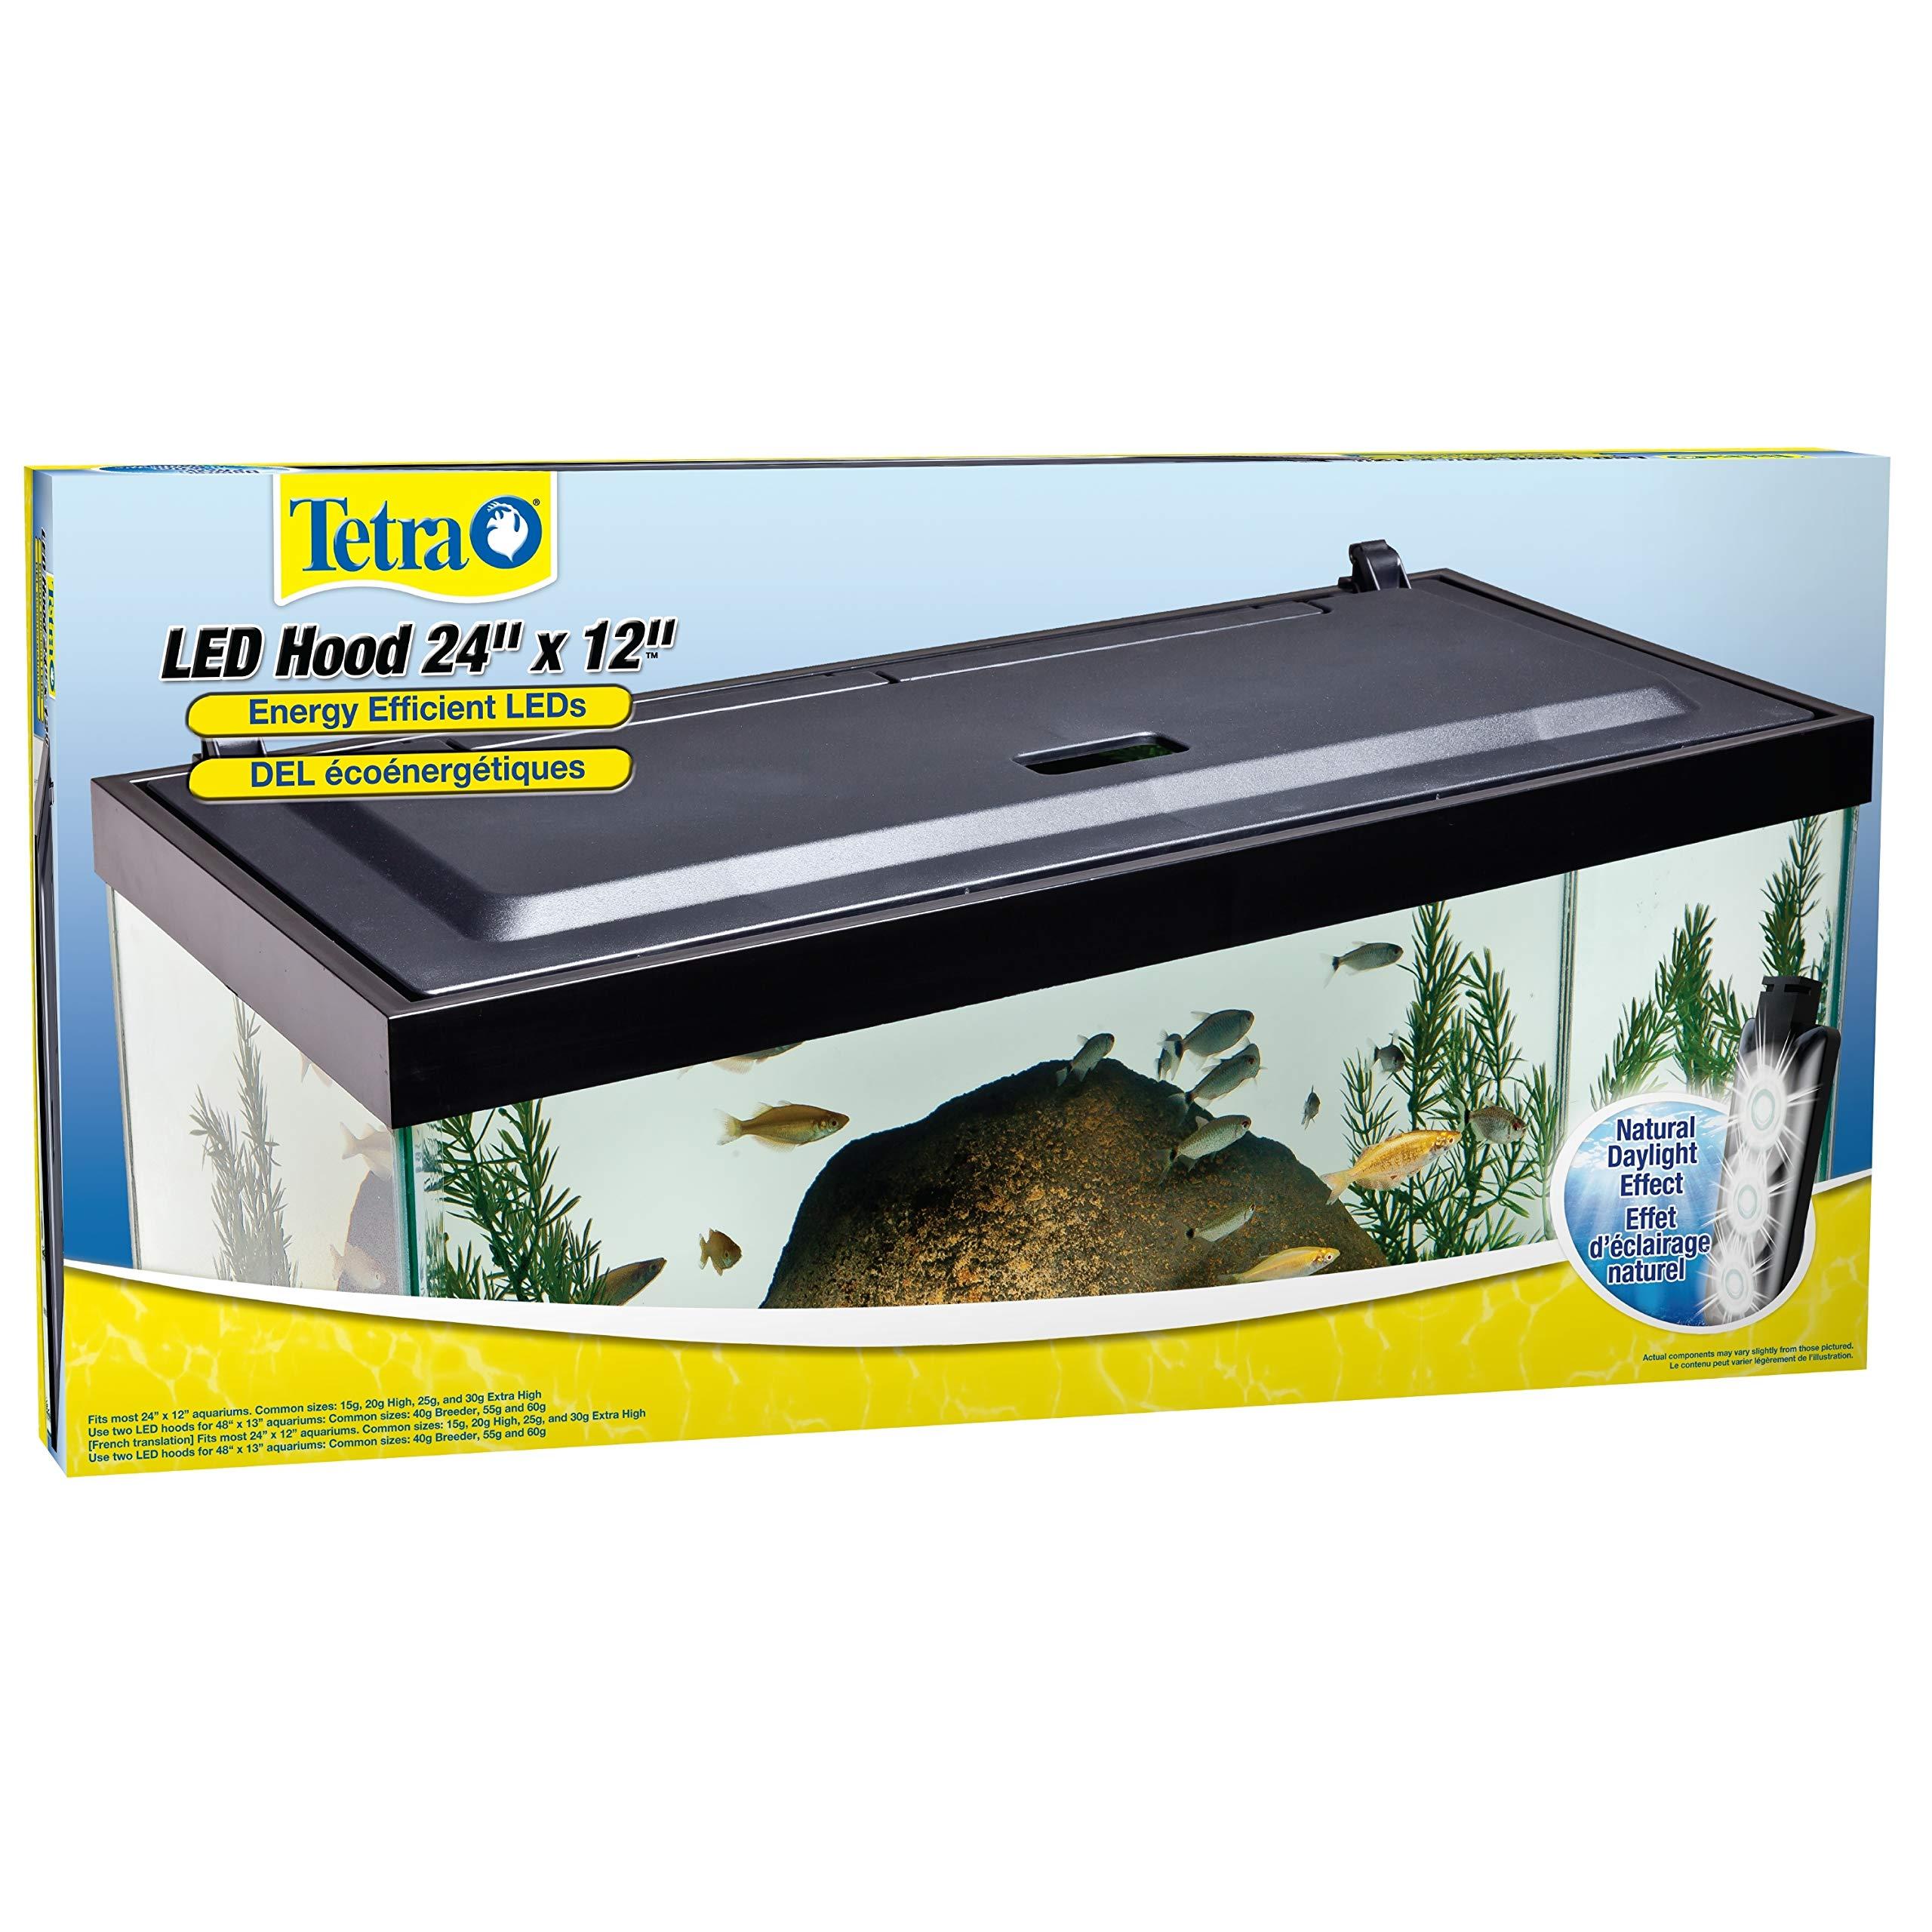 Tetra LED Aquarium Hood, Low Profile, Energy Efficient, 24 inch by Tetra